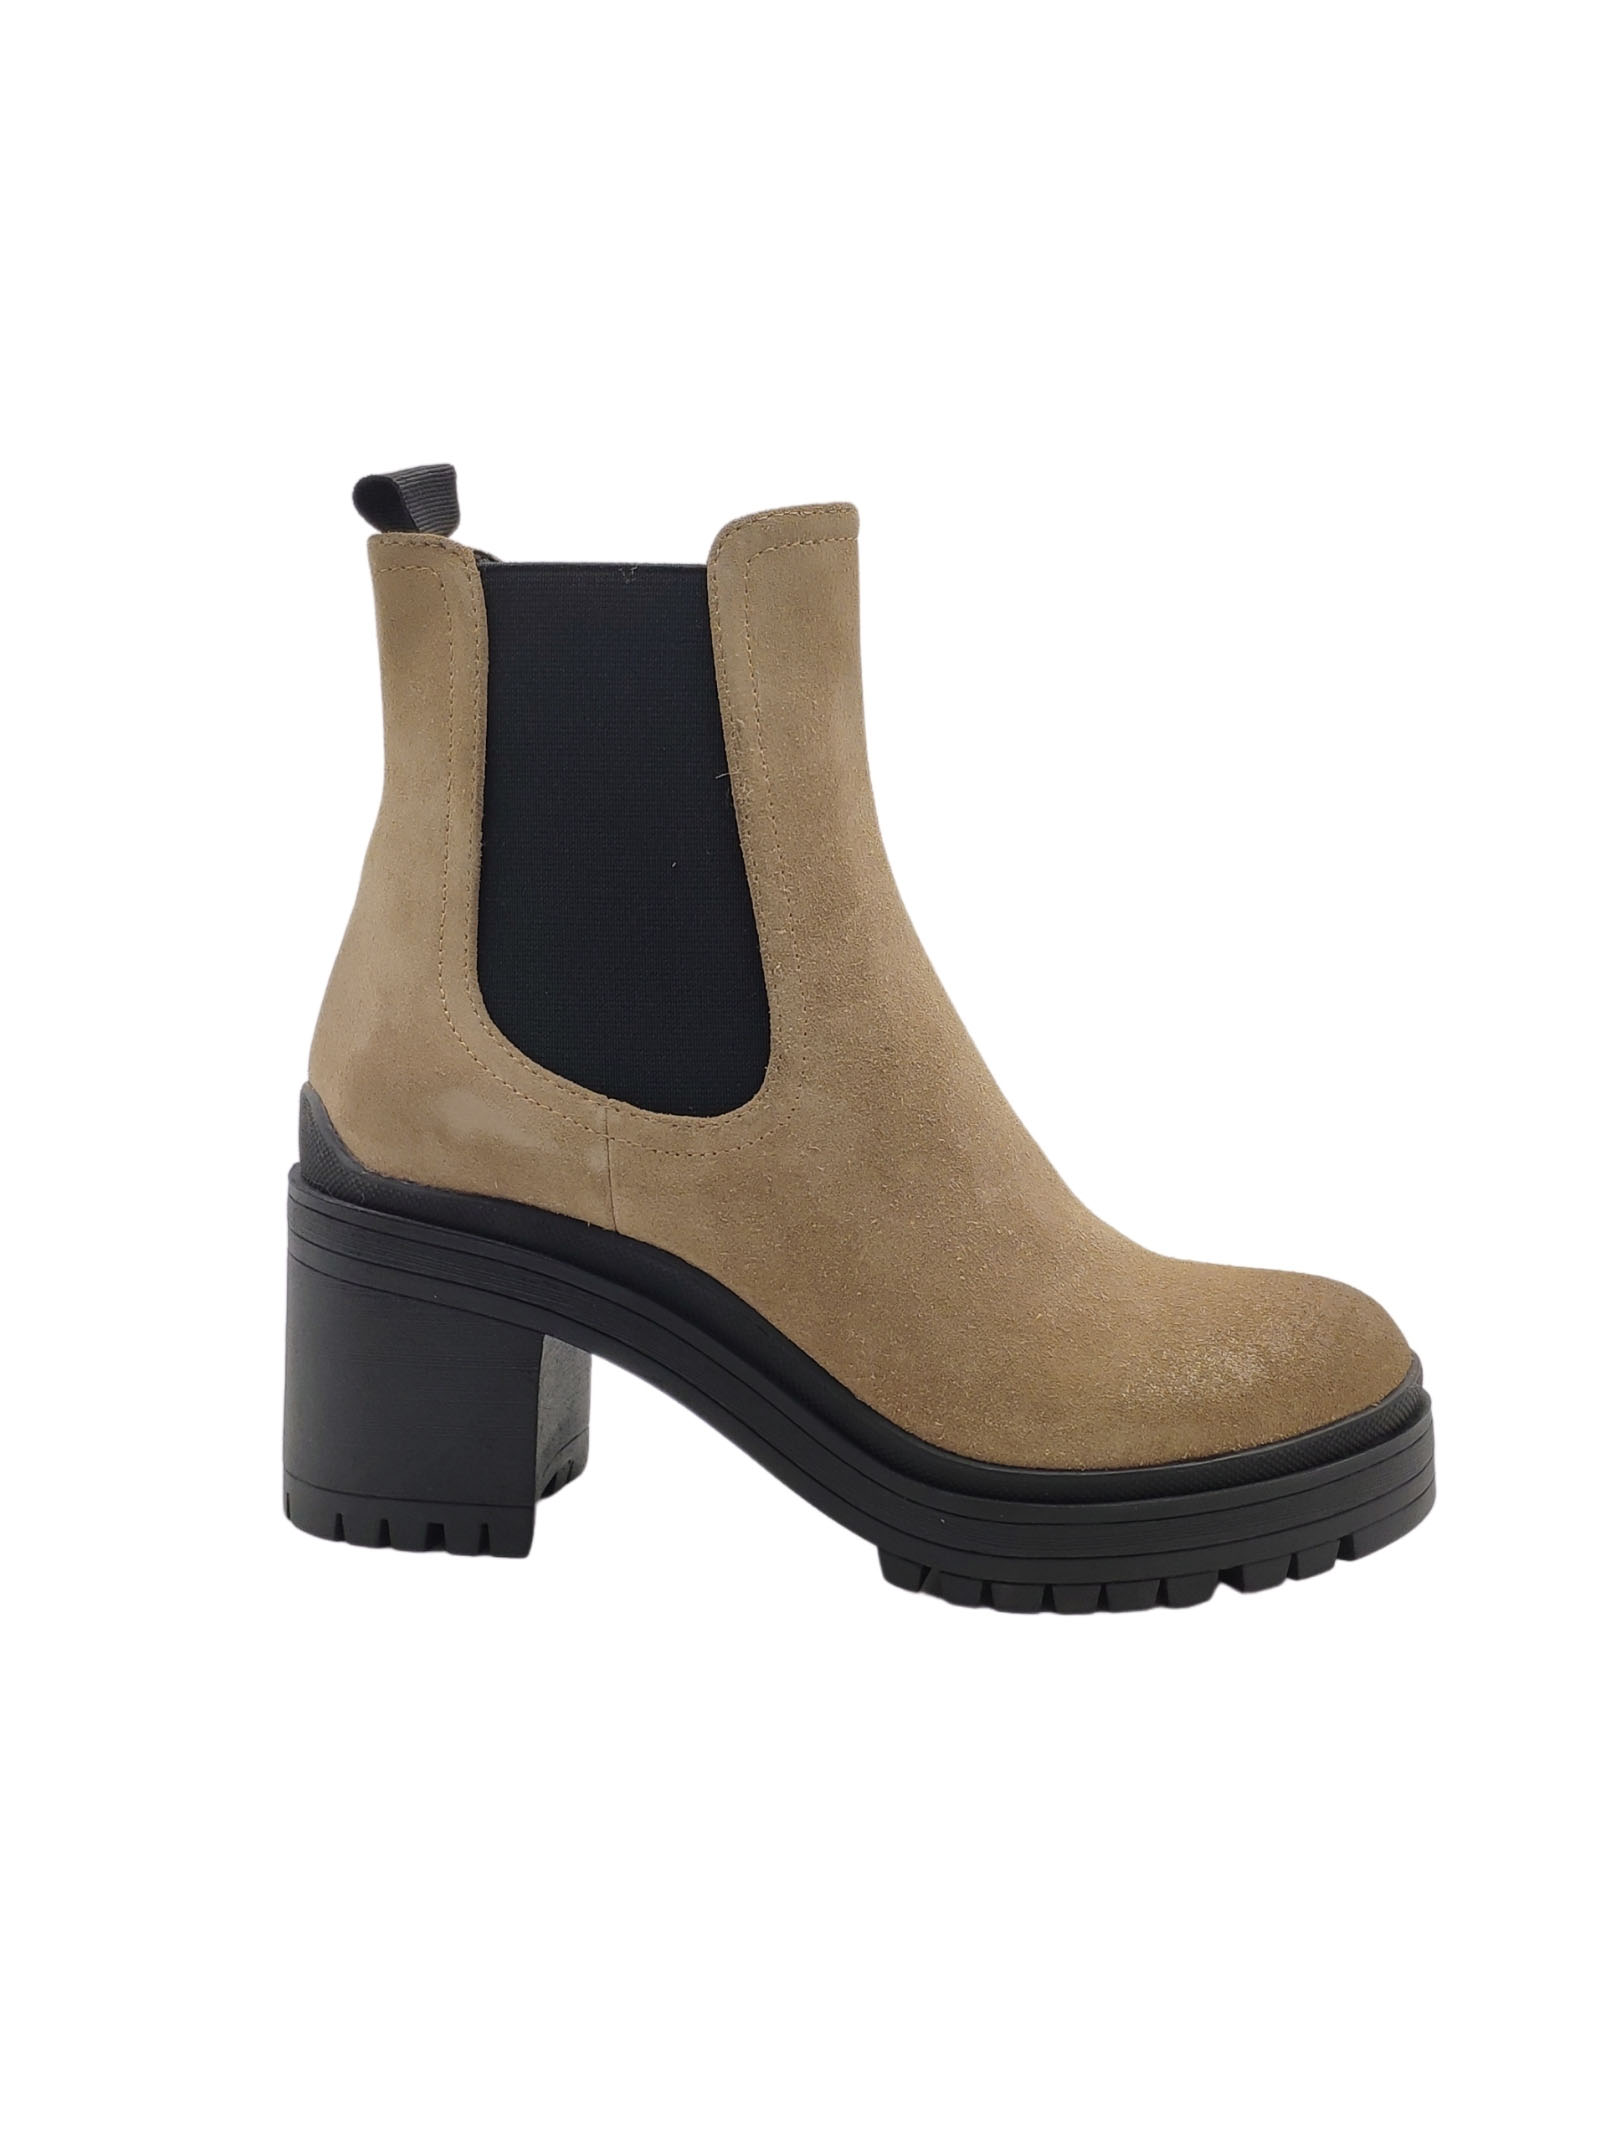 Beatles Women's Ankle Boots Prime By Bruno Premi | Ankle Boots | AZ1102XBEIGE